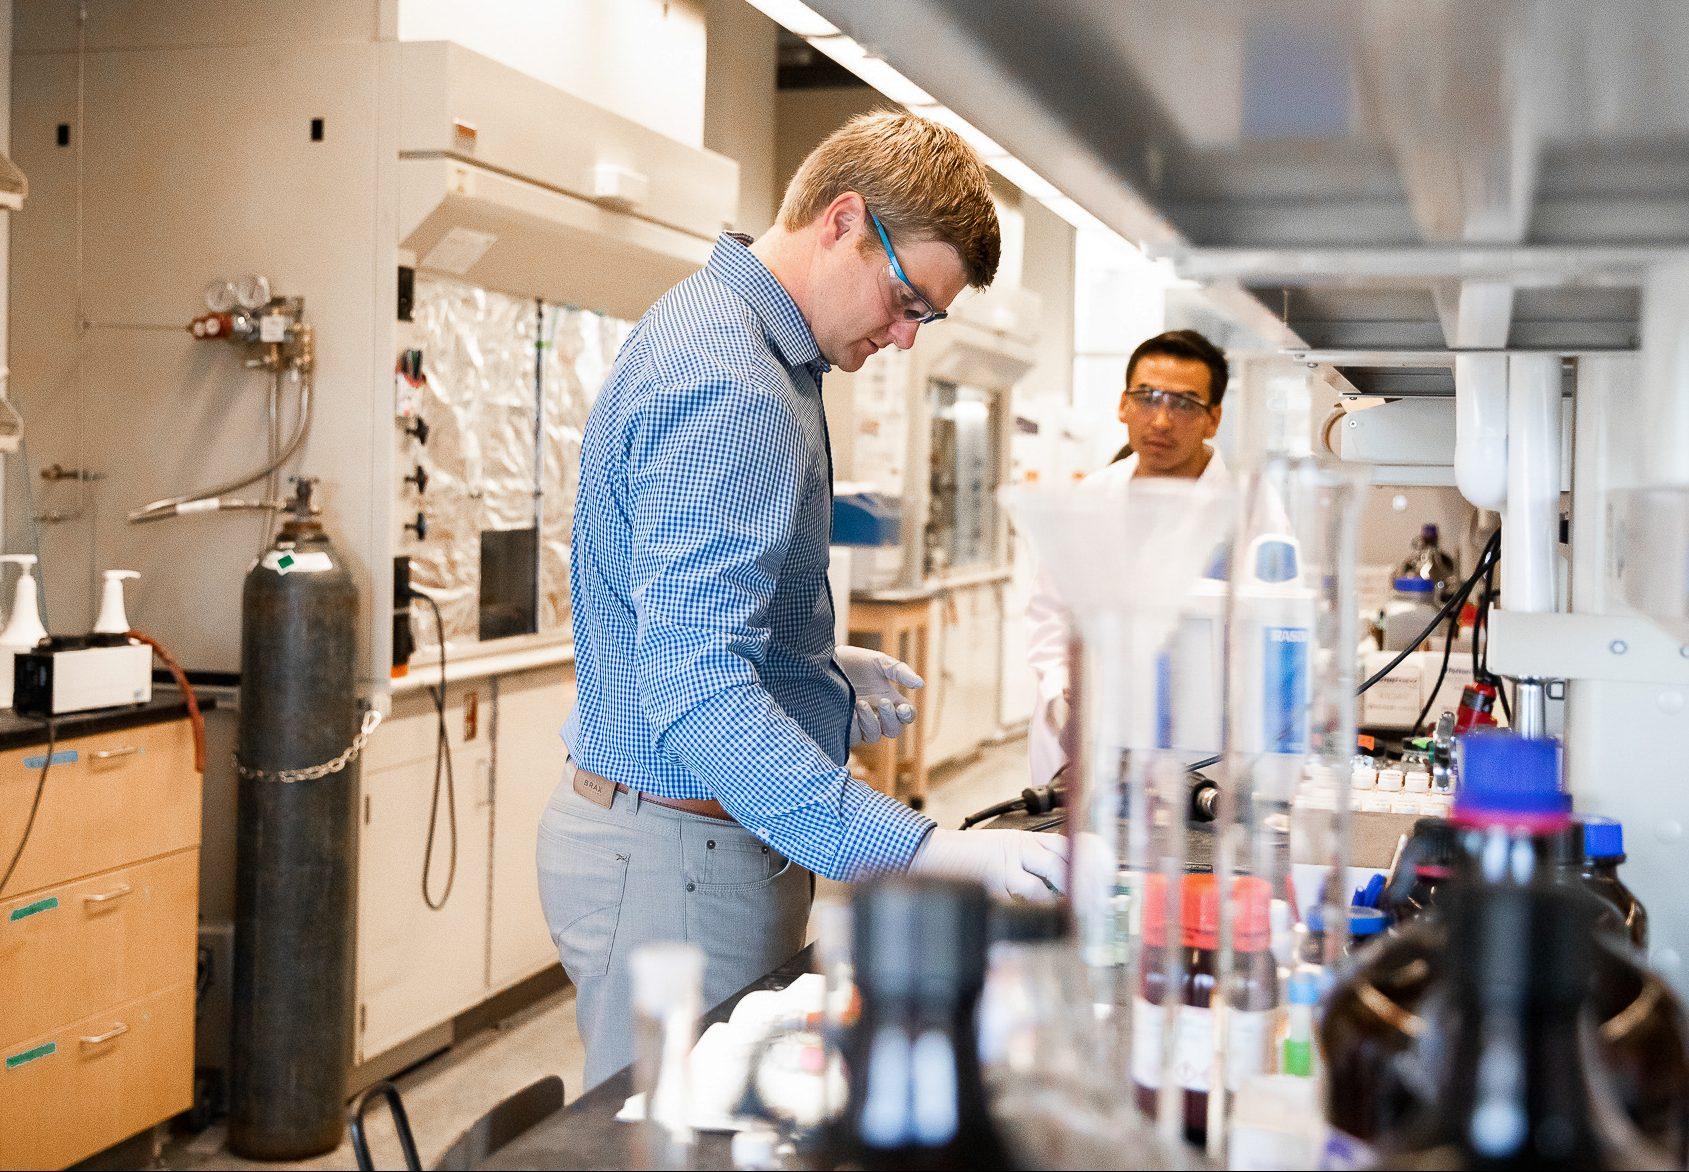 Brett VanVeller works in his lab